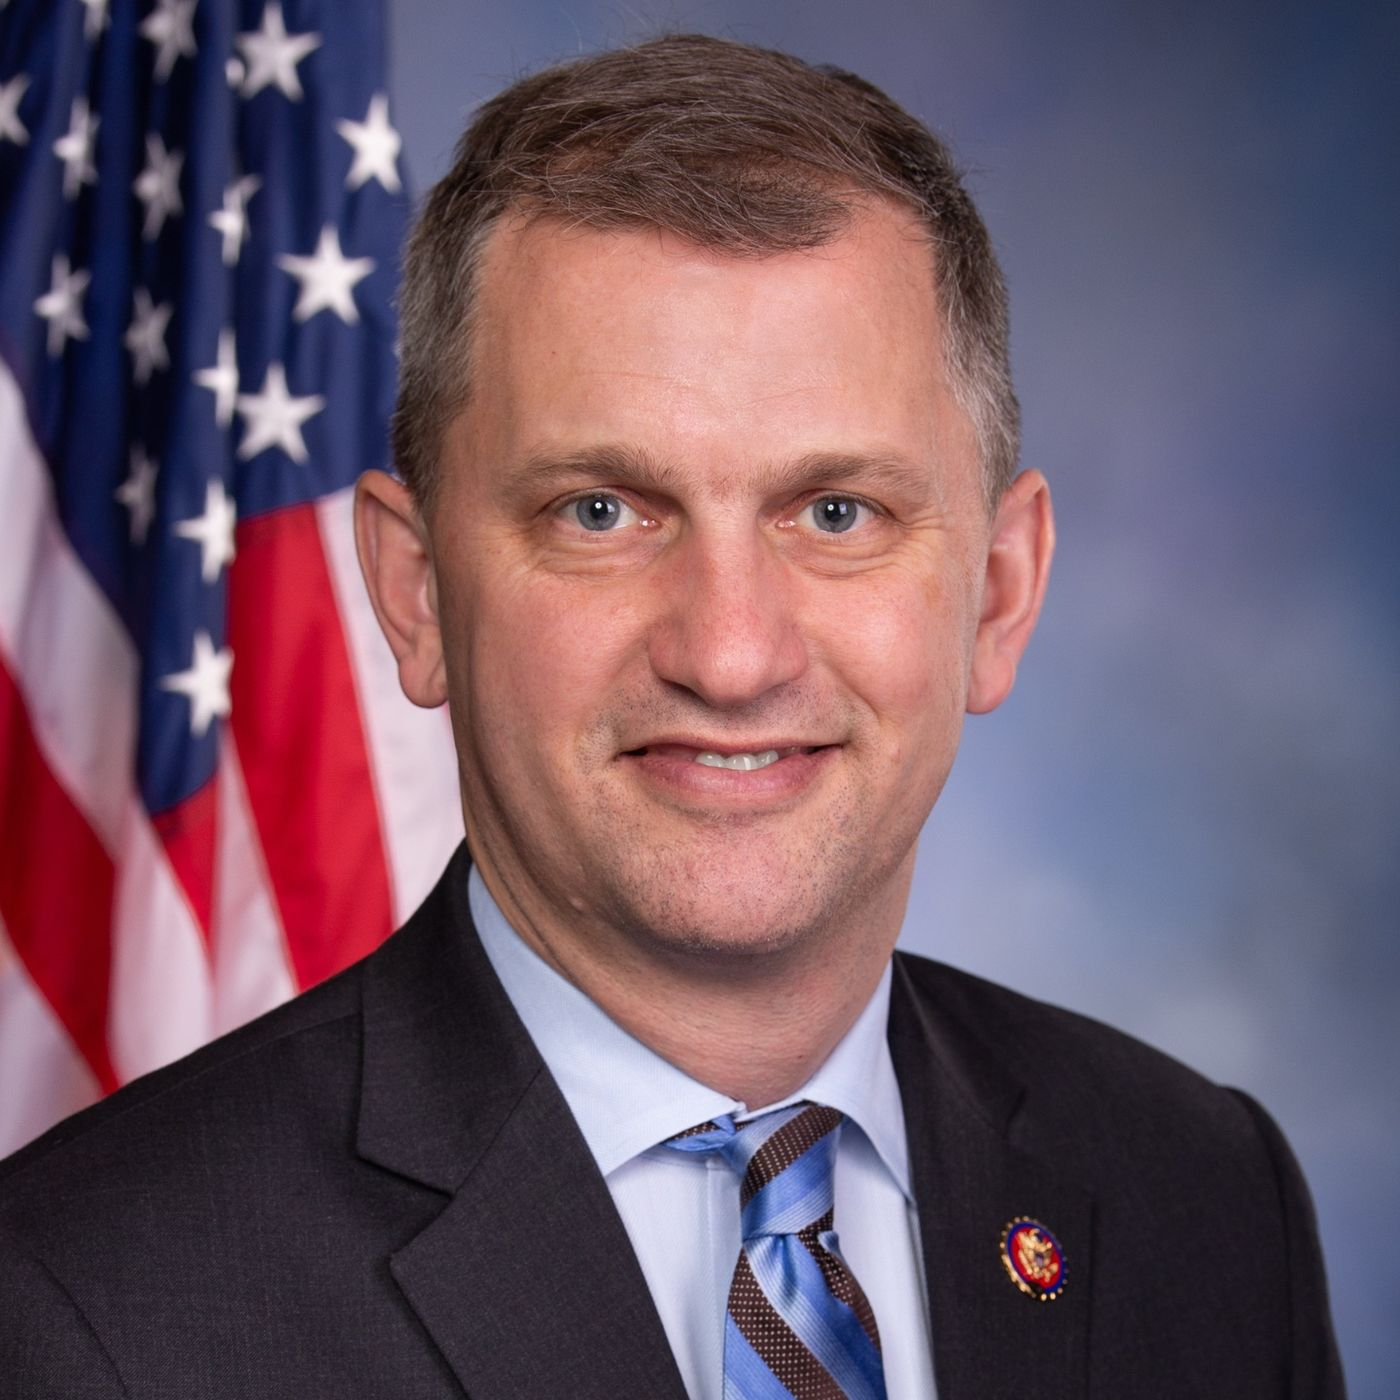 Rep. Sean Casten